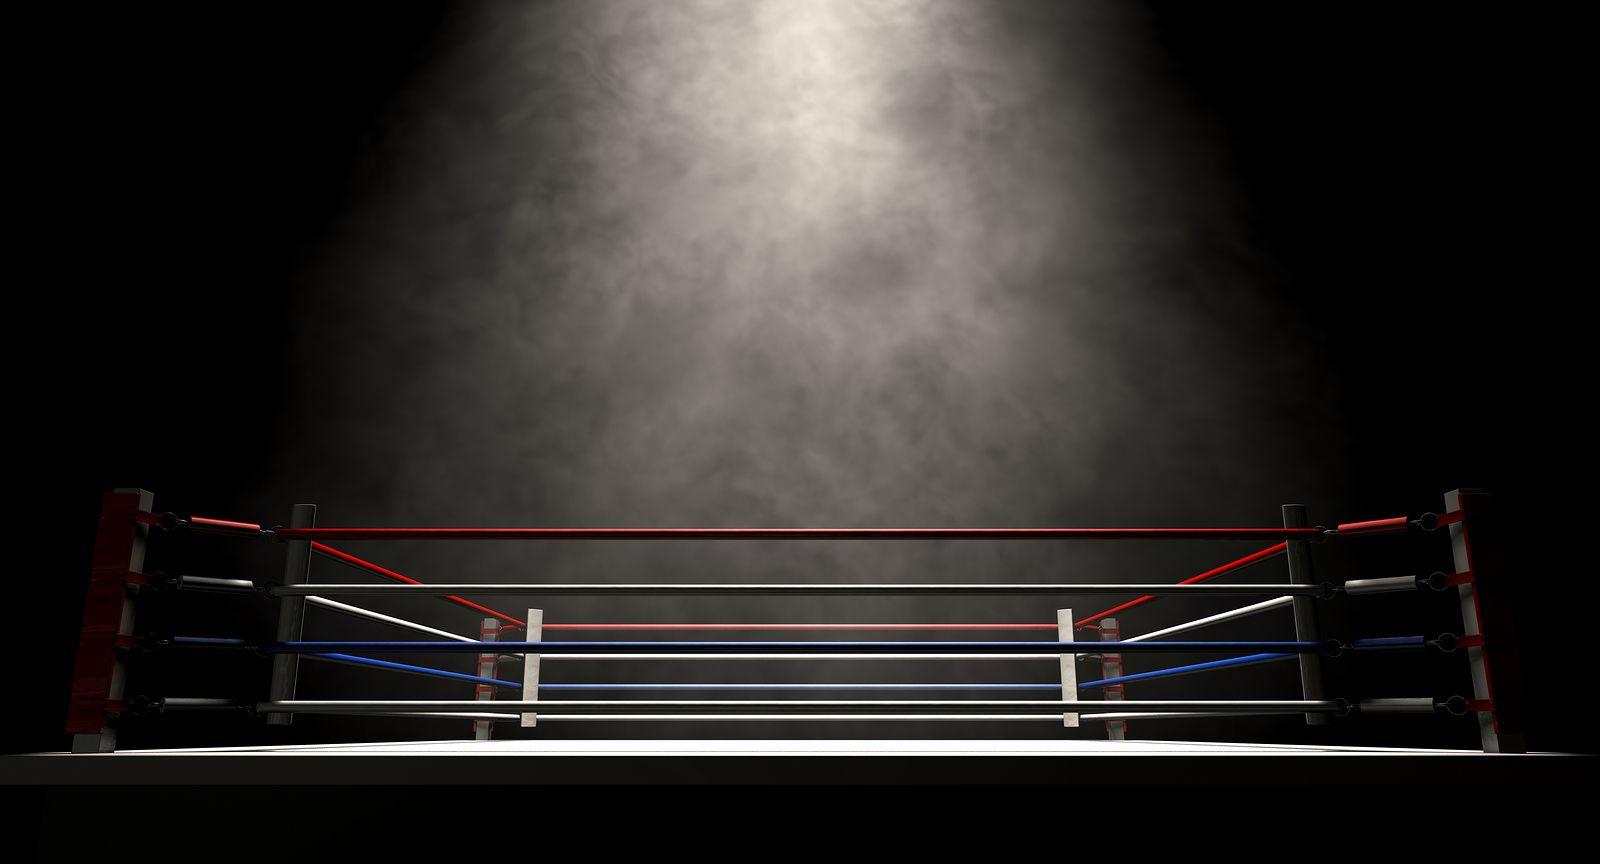 Boxing-Ring-Spotlit-Dark_lxrn5d.jpg (1600×864)